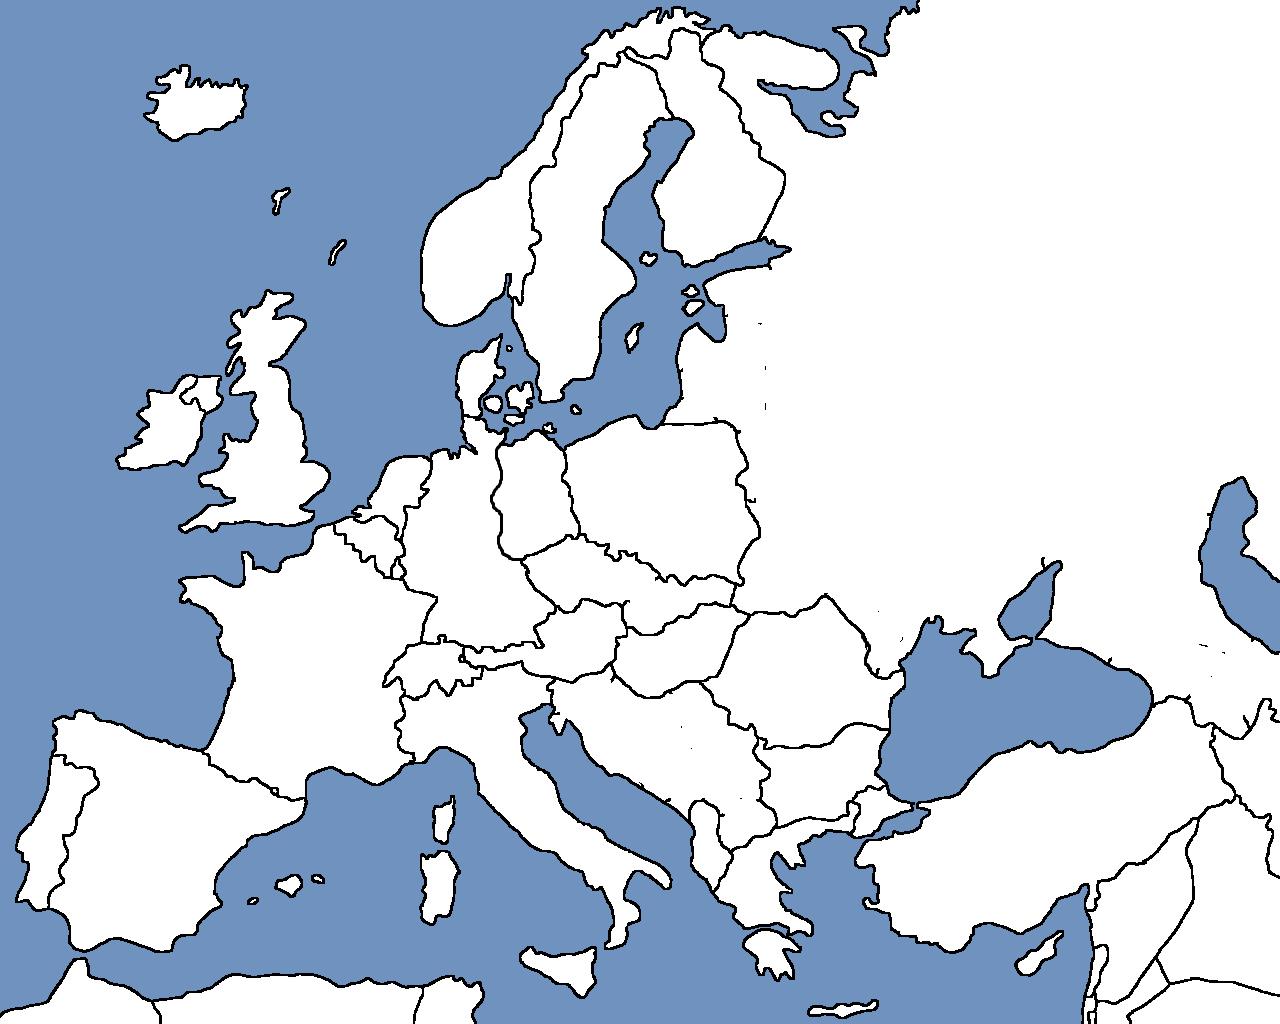 Cold War Map By Joaomordecaimapper Cold War Map By Joaomordecaimapper